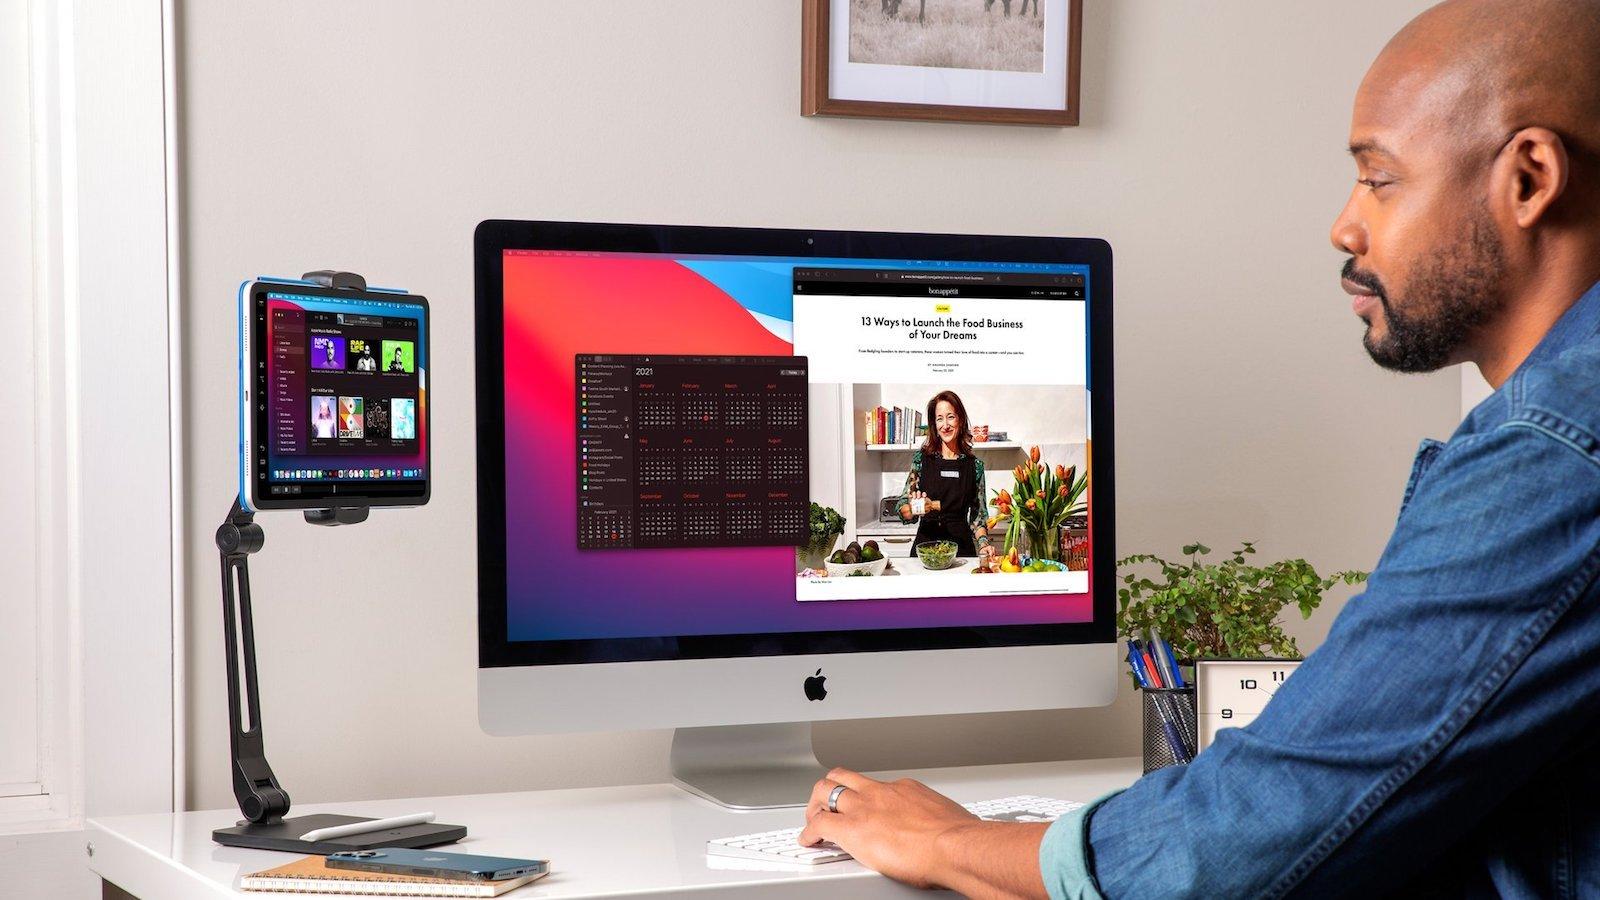 12 iPad gadgets you need at work